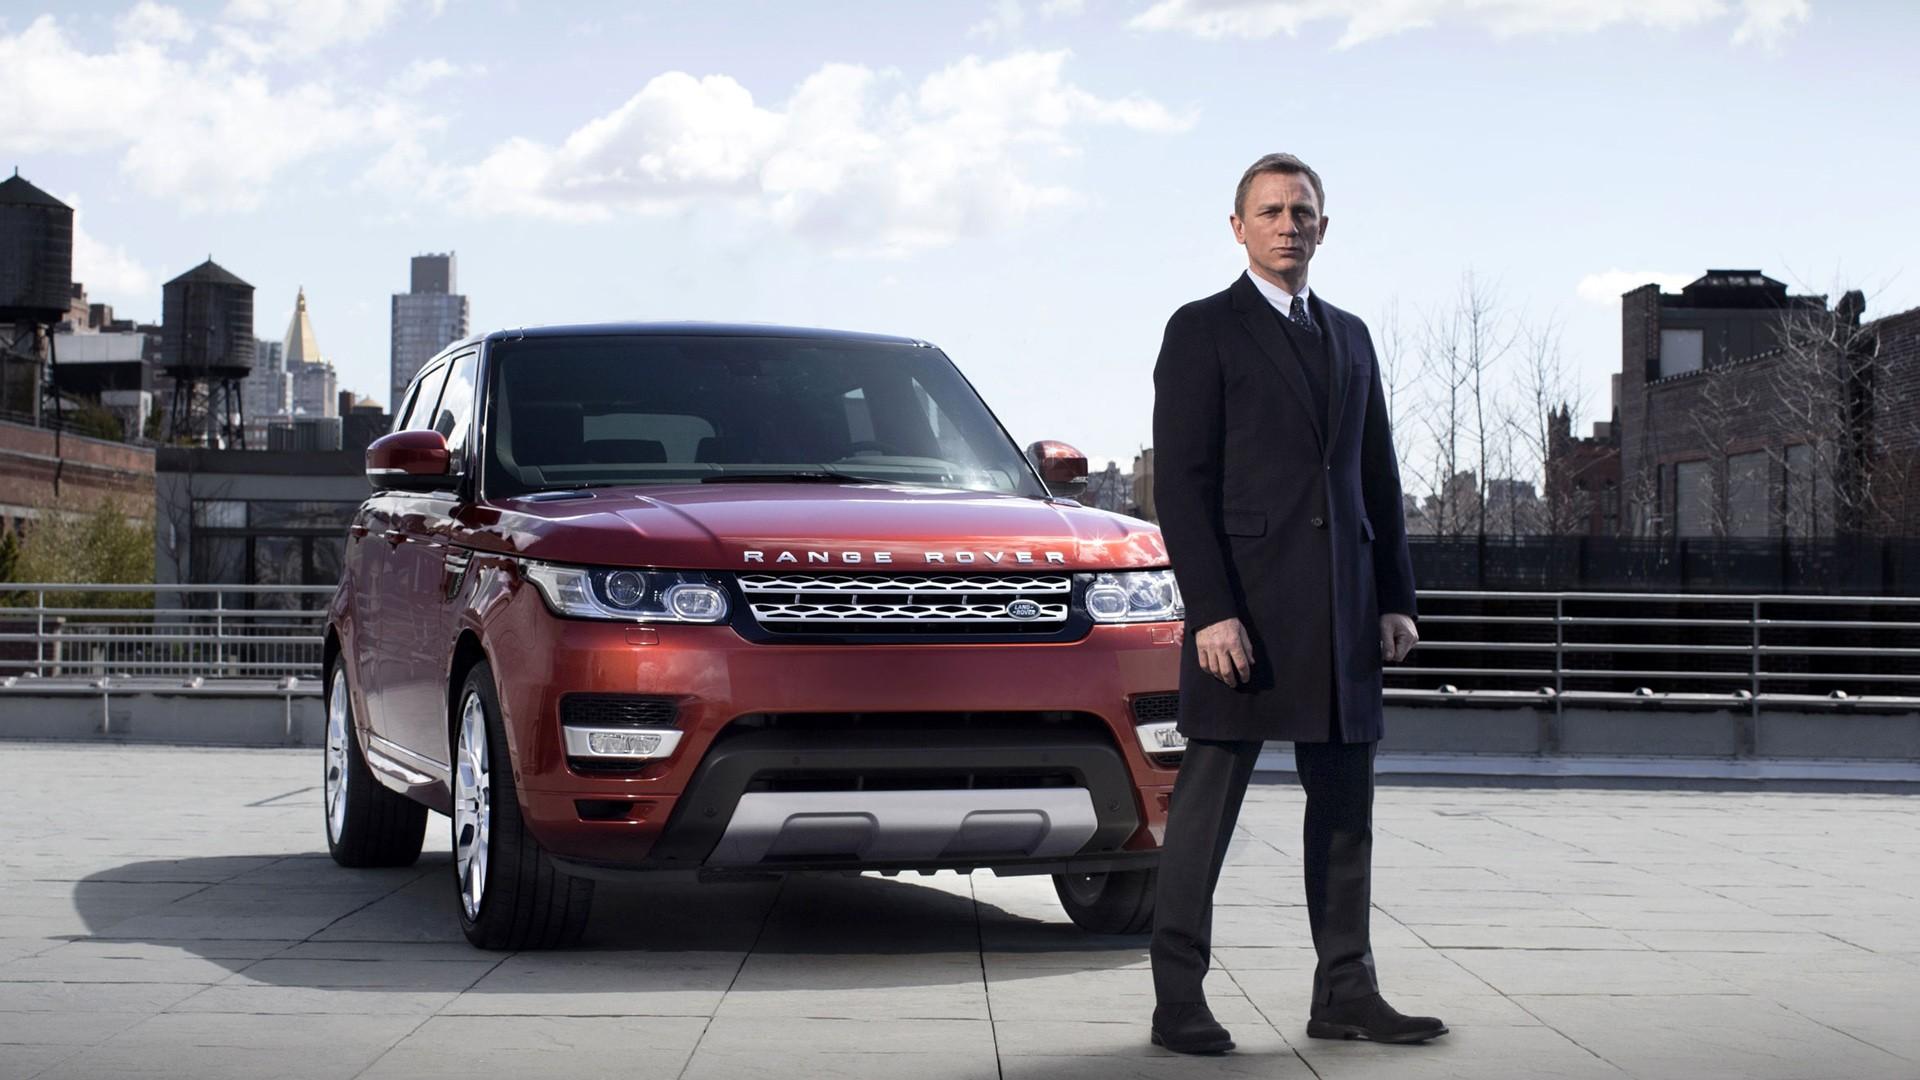 2014 Range Rover Sport James Bond Wallpaper Hd Car Wallpapers Id